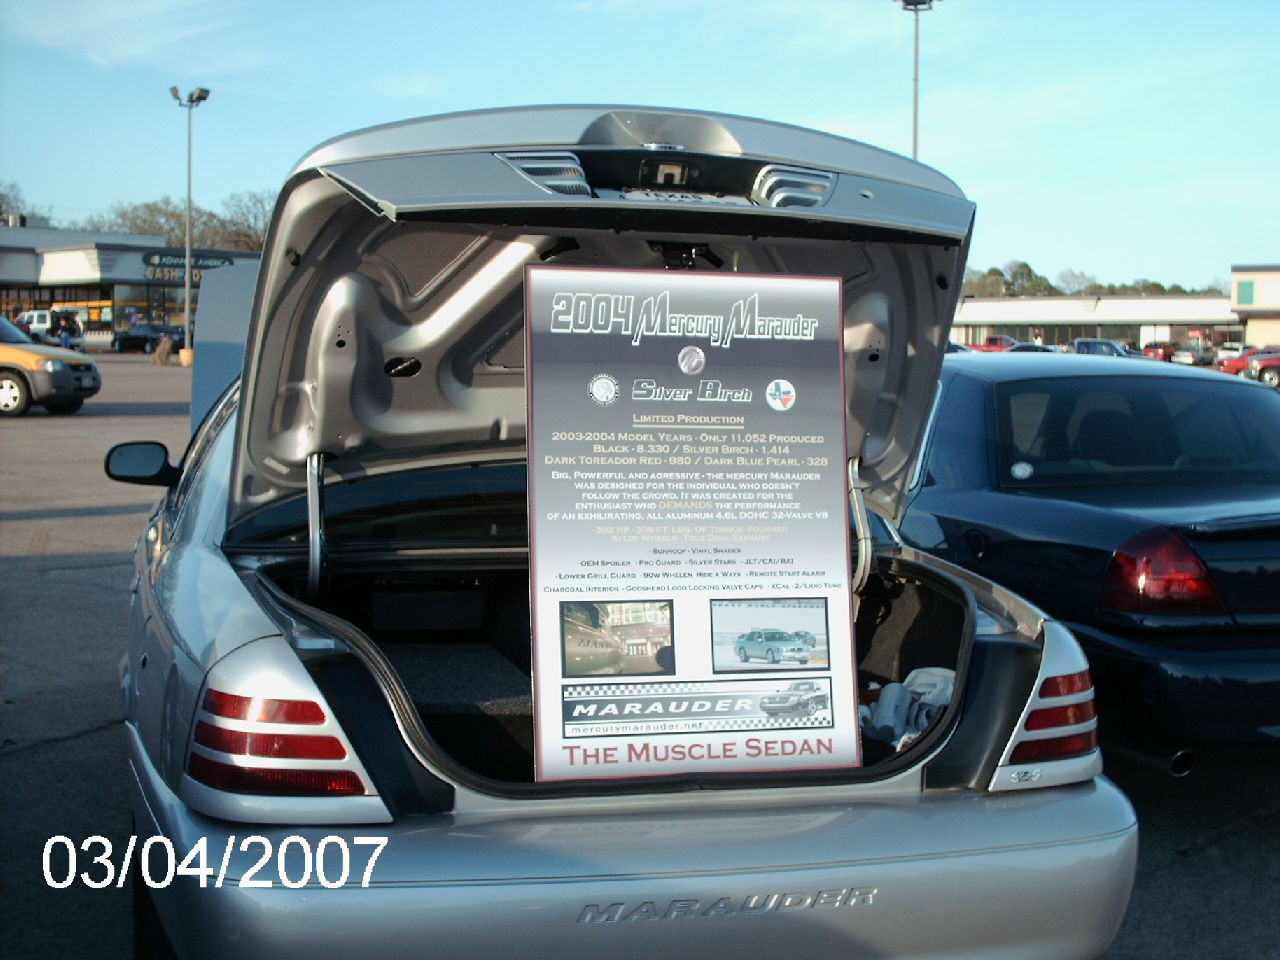 Need Ideas For A Show Board For Car Shows MercuryMaraudernet Forums - Car show display board ideas